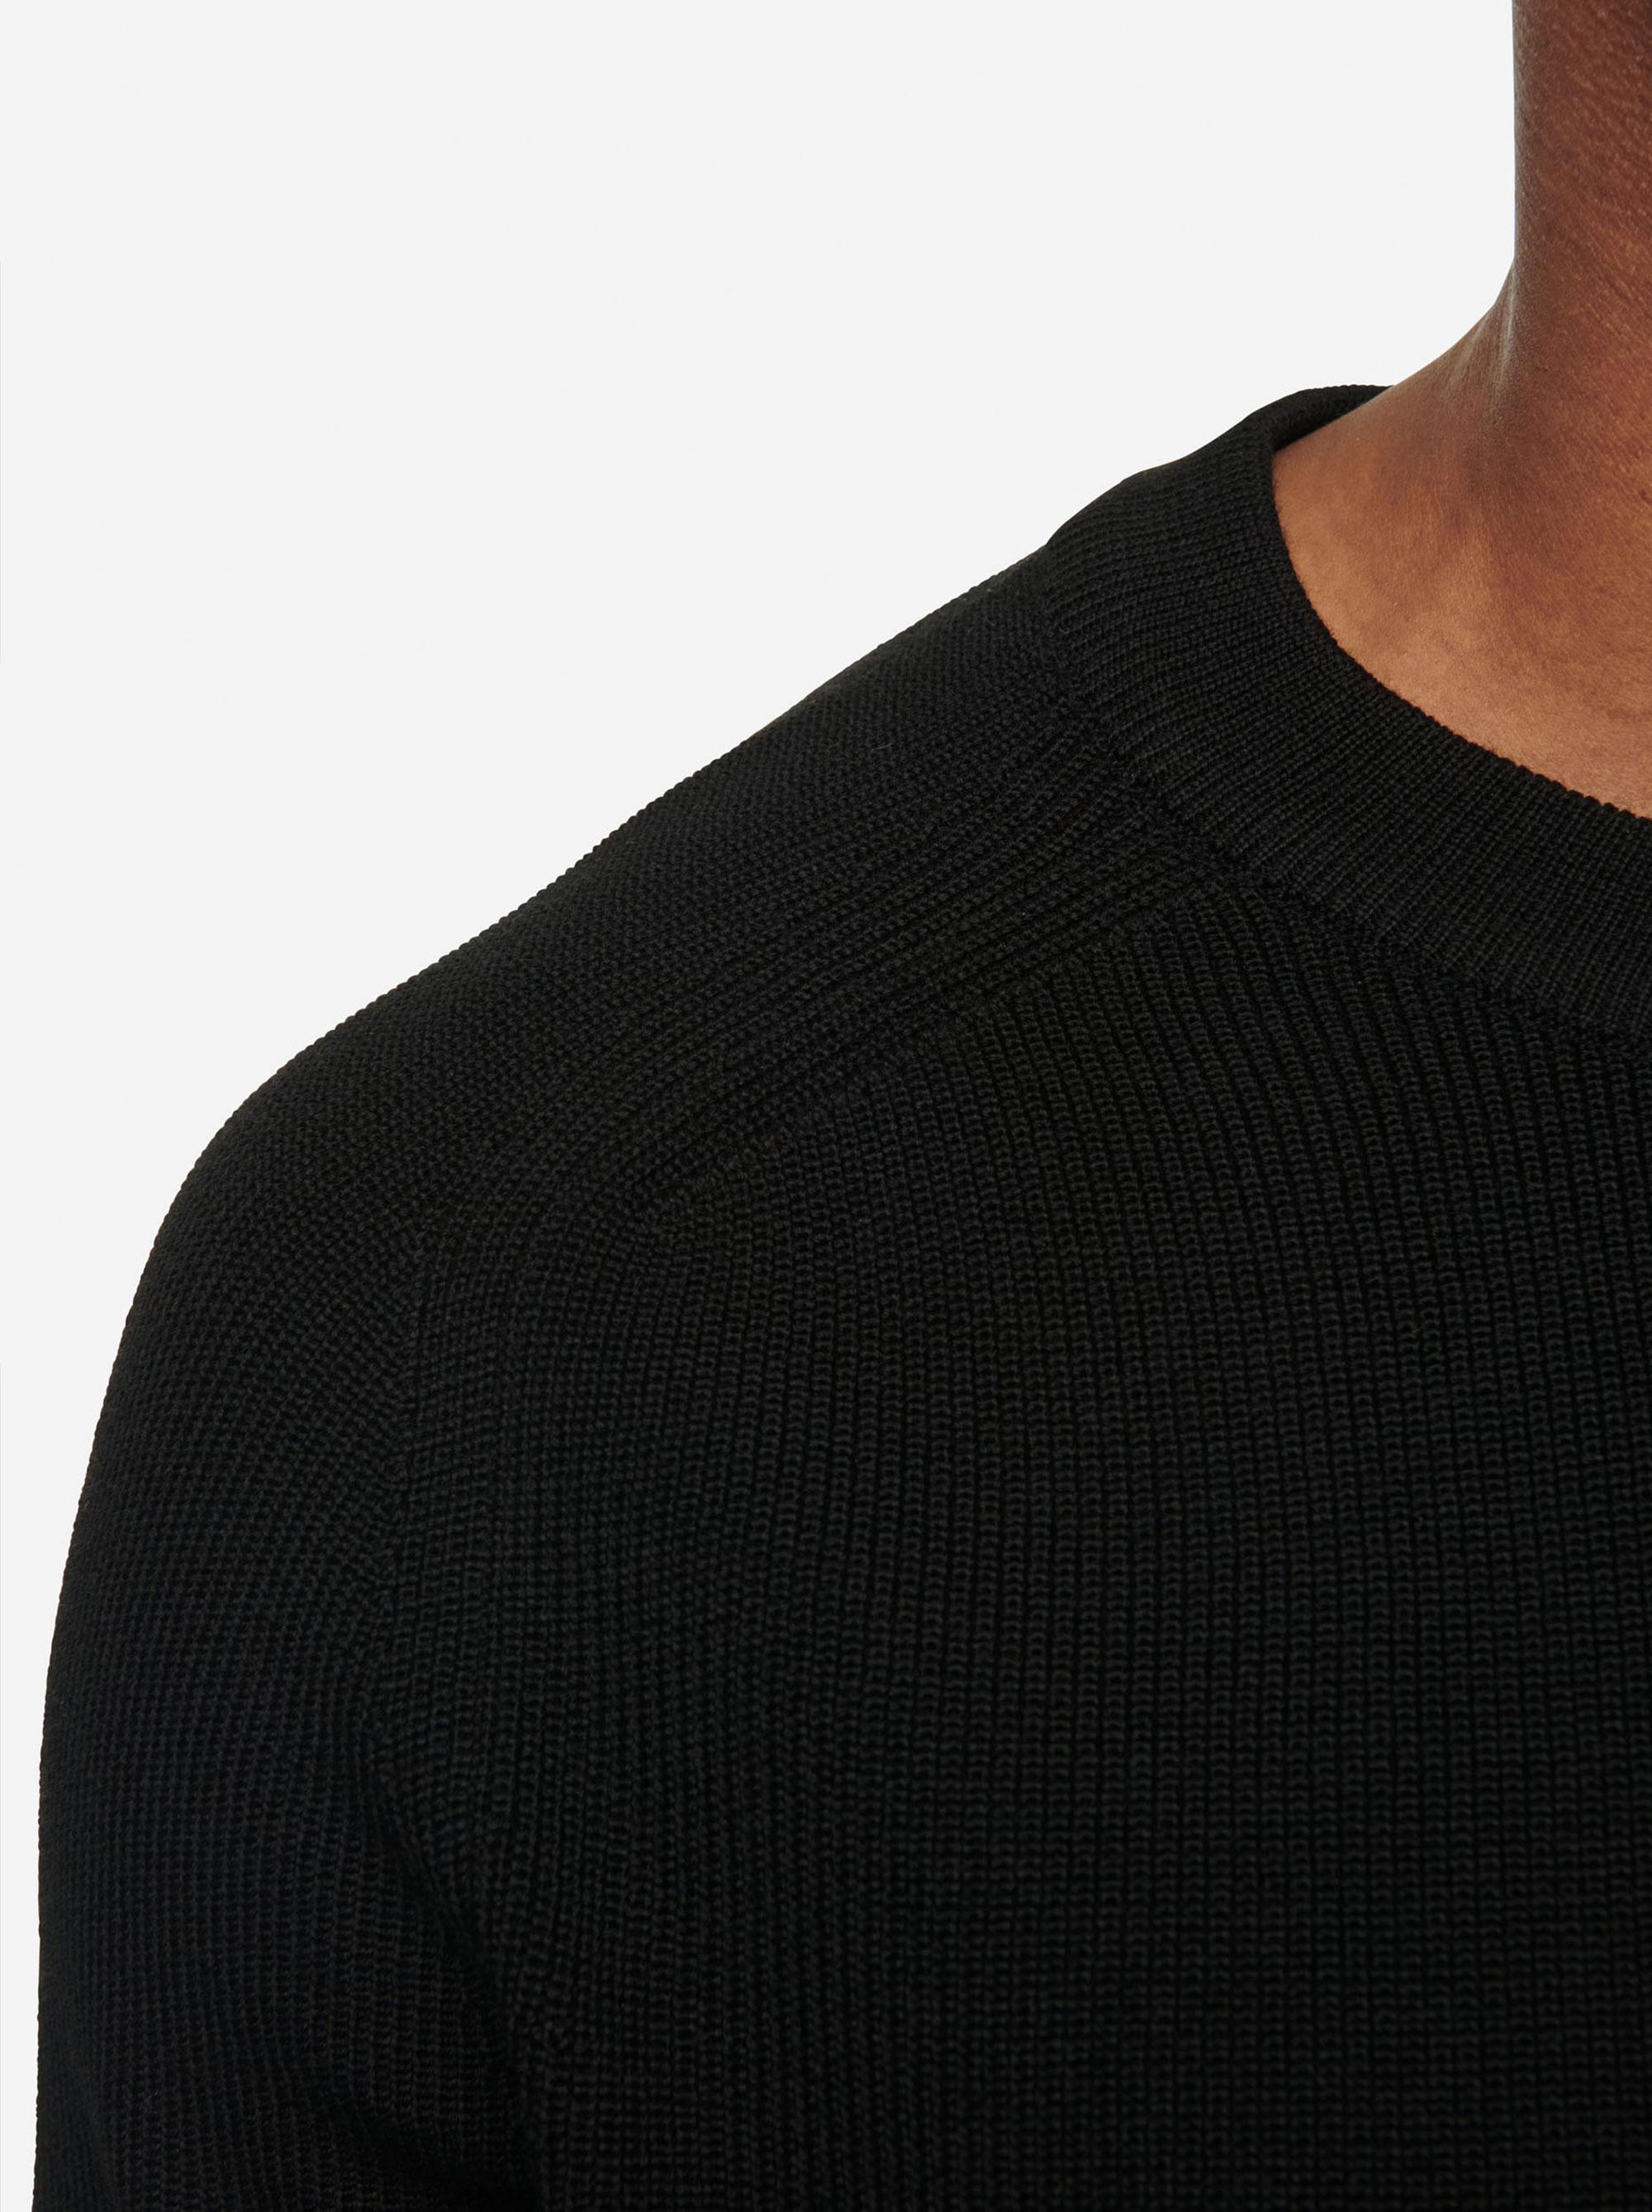 Teym - The Merino Sweater - Men - Black - 9